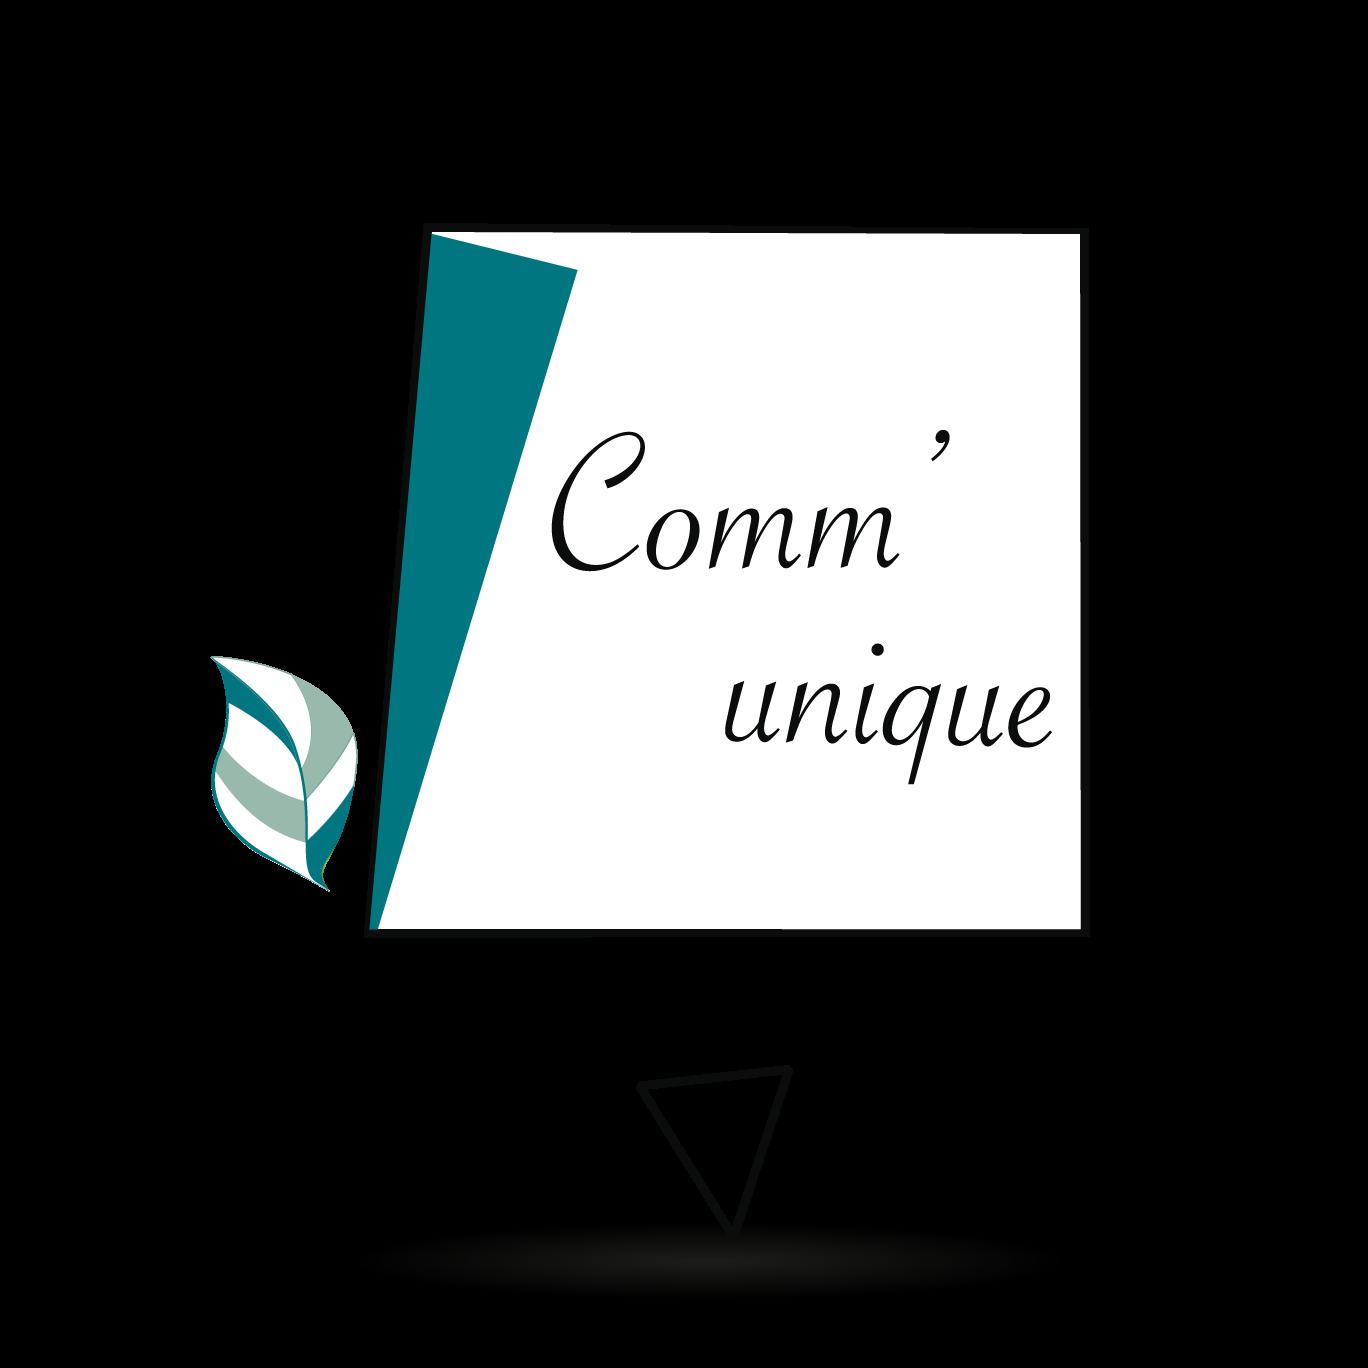 icone communication 7essentiels